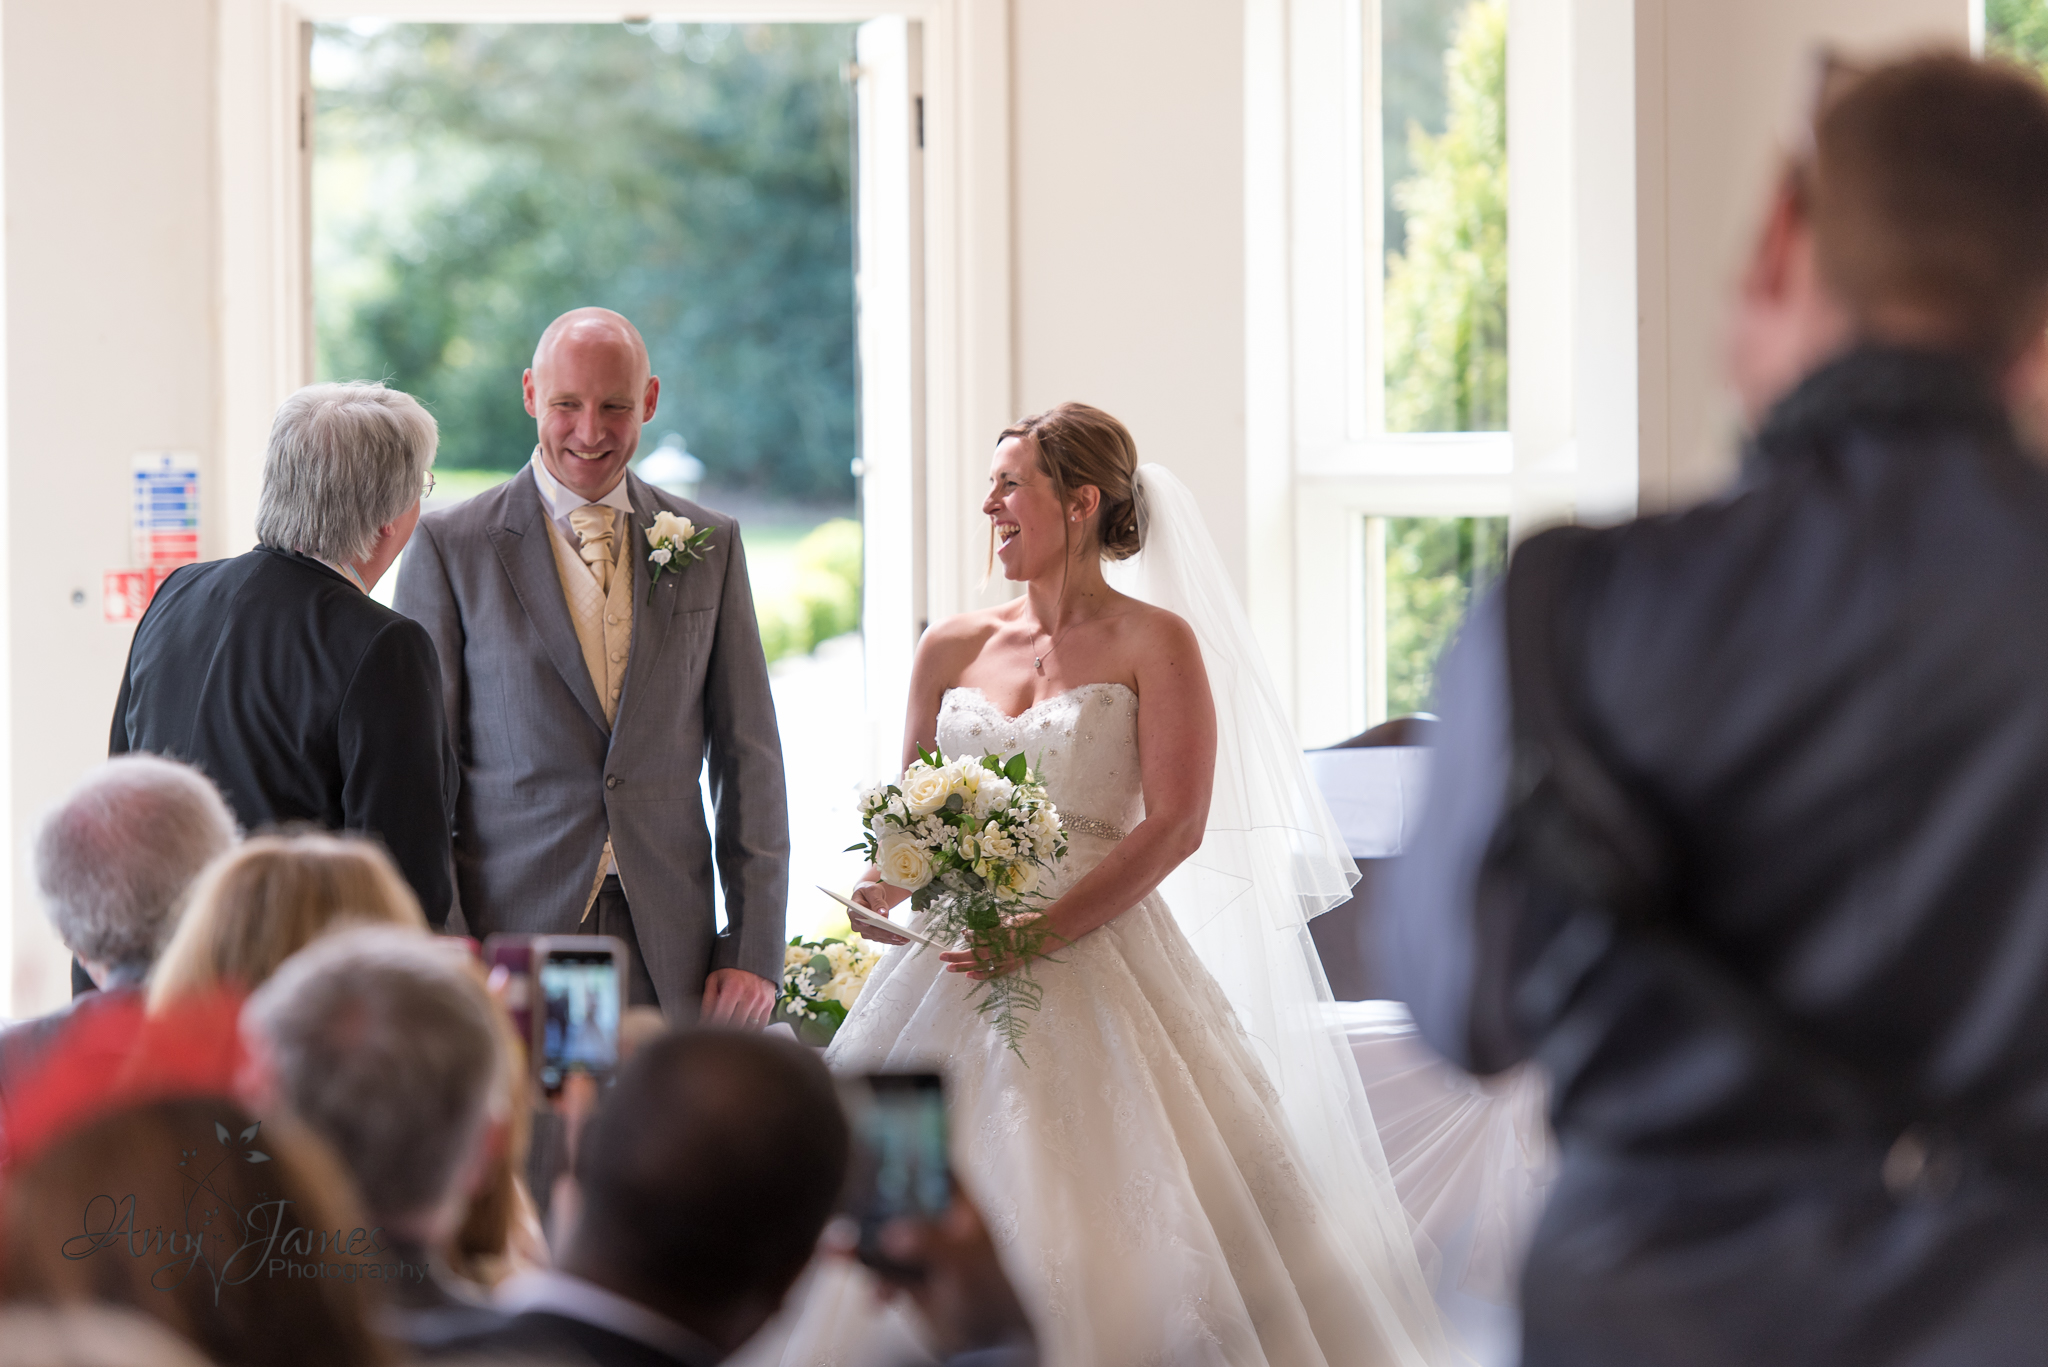 Hampshire wedding venues // Wedding Photographer Hampshire // Surrey Wedding Venues // Basingstoke Wedding // Audleys Wood Hotel Wedding // Amy James Photography